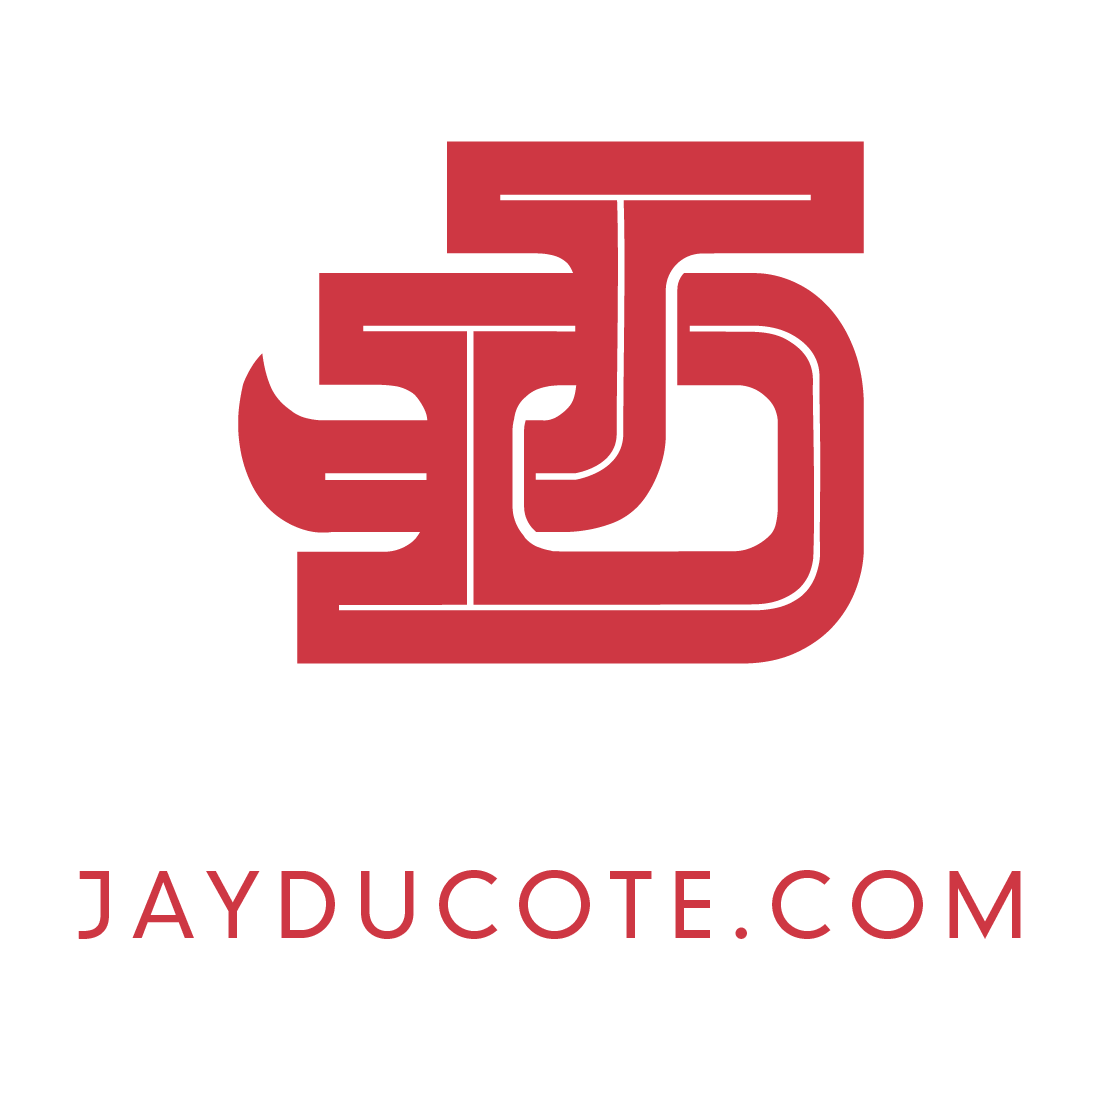 jayducotecombbq1100.png